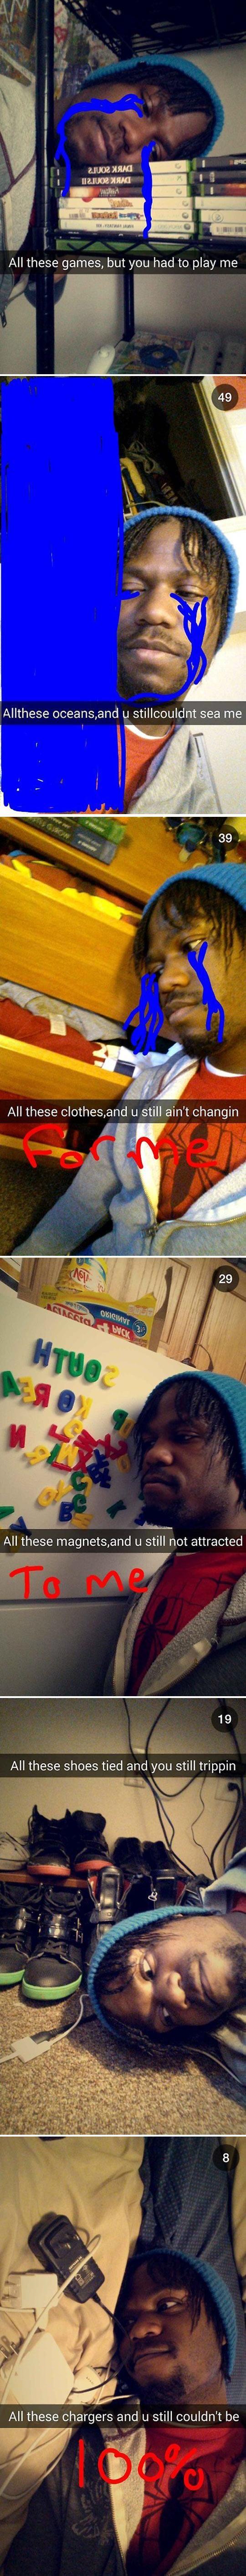 Funny Snapchat Photos. Part 2 (24 pics)